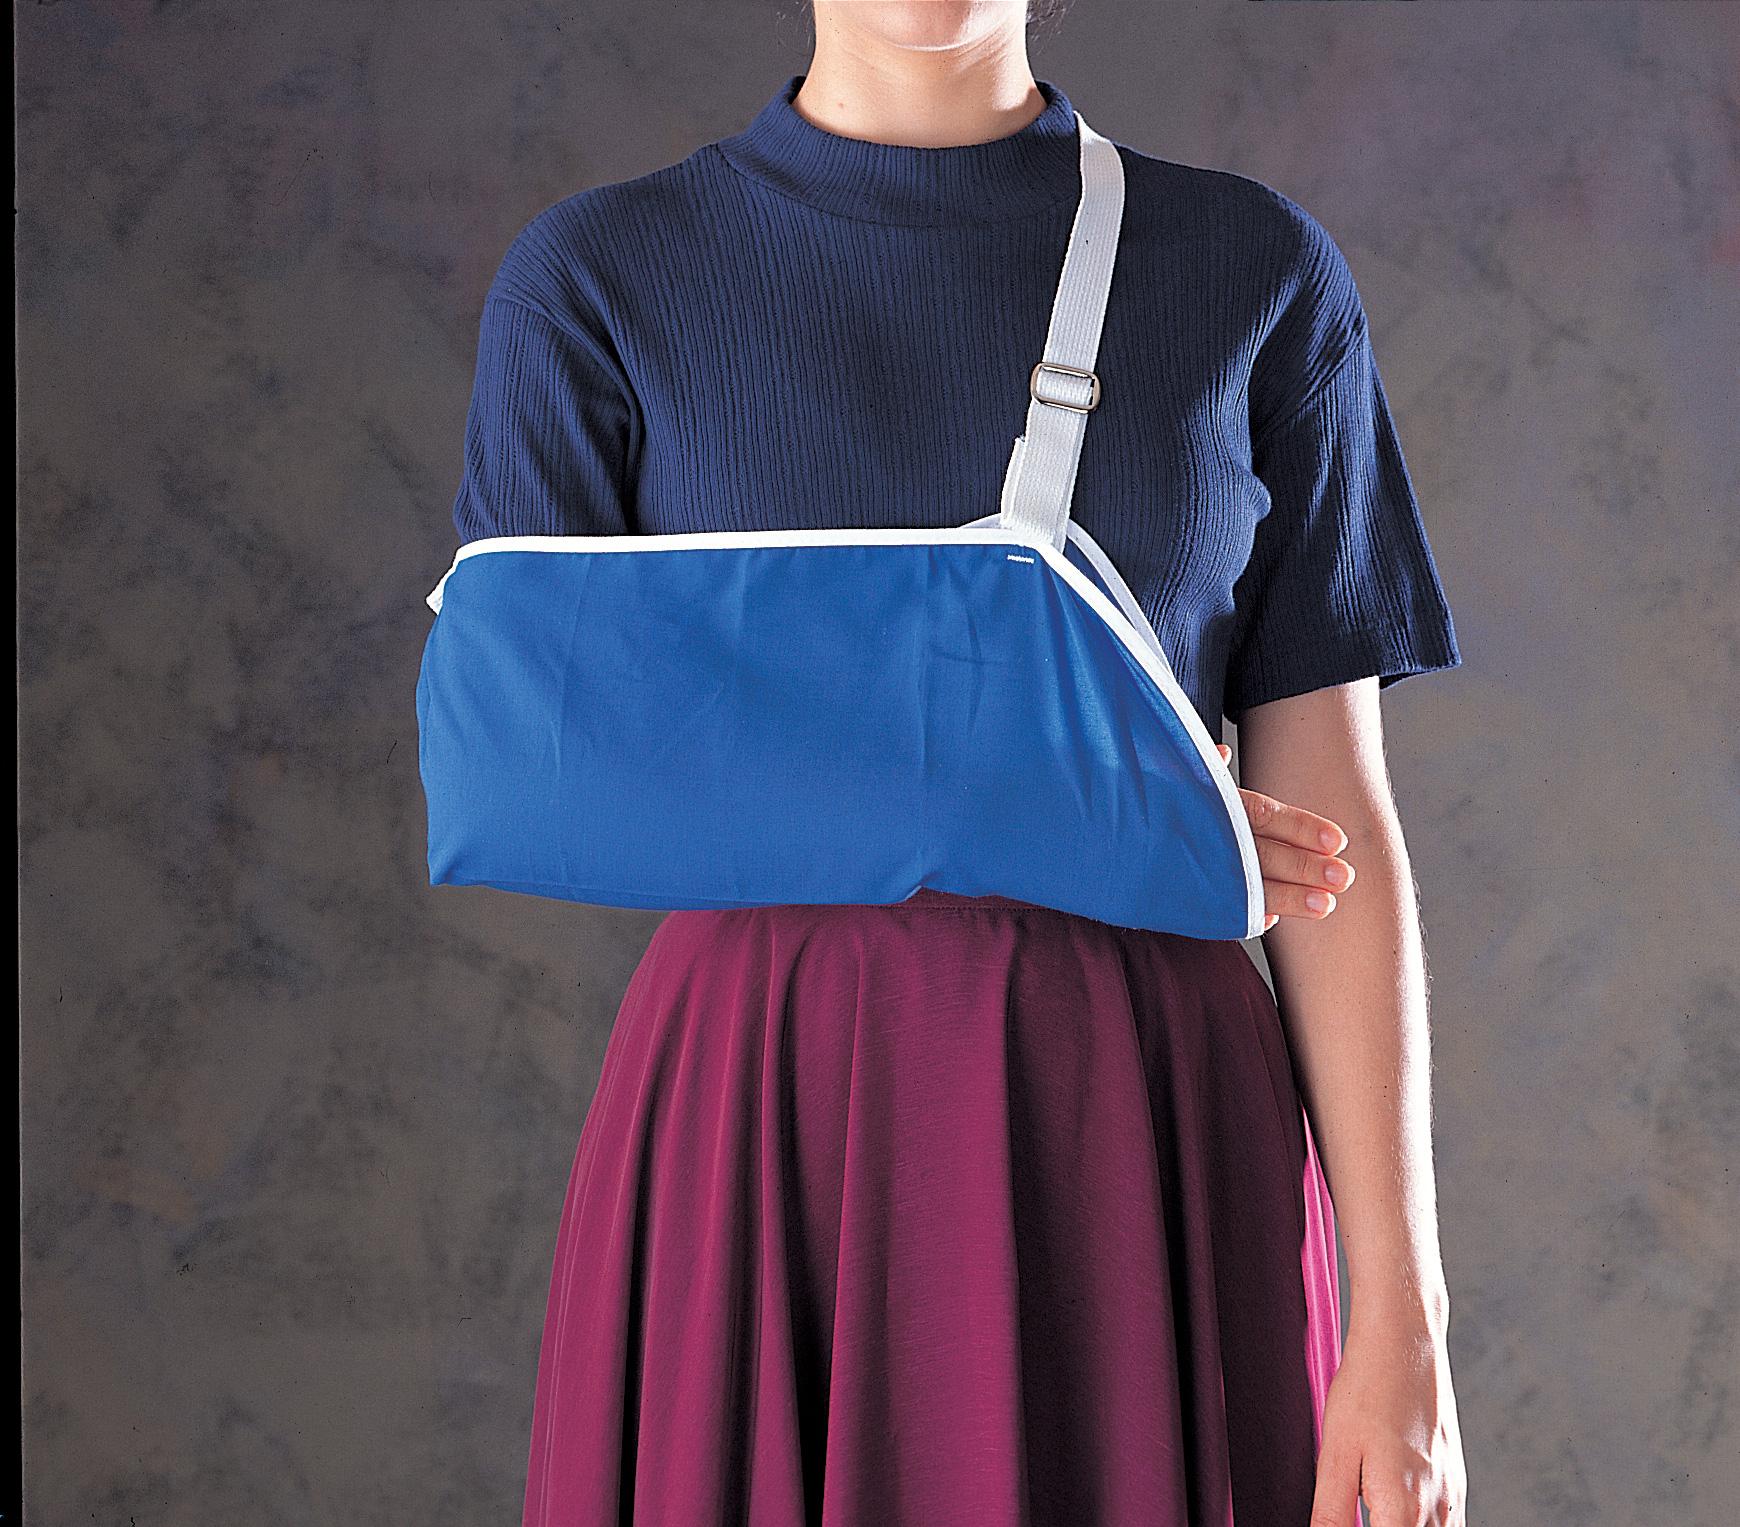 ARM SLING (HART100)